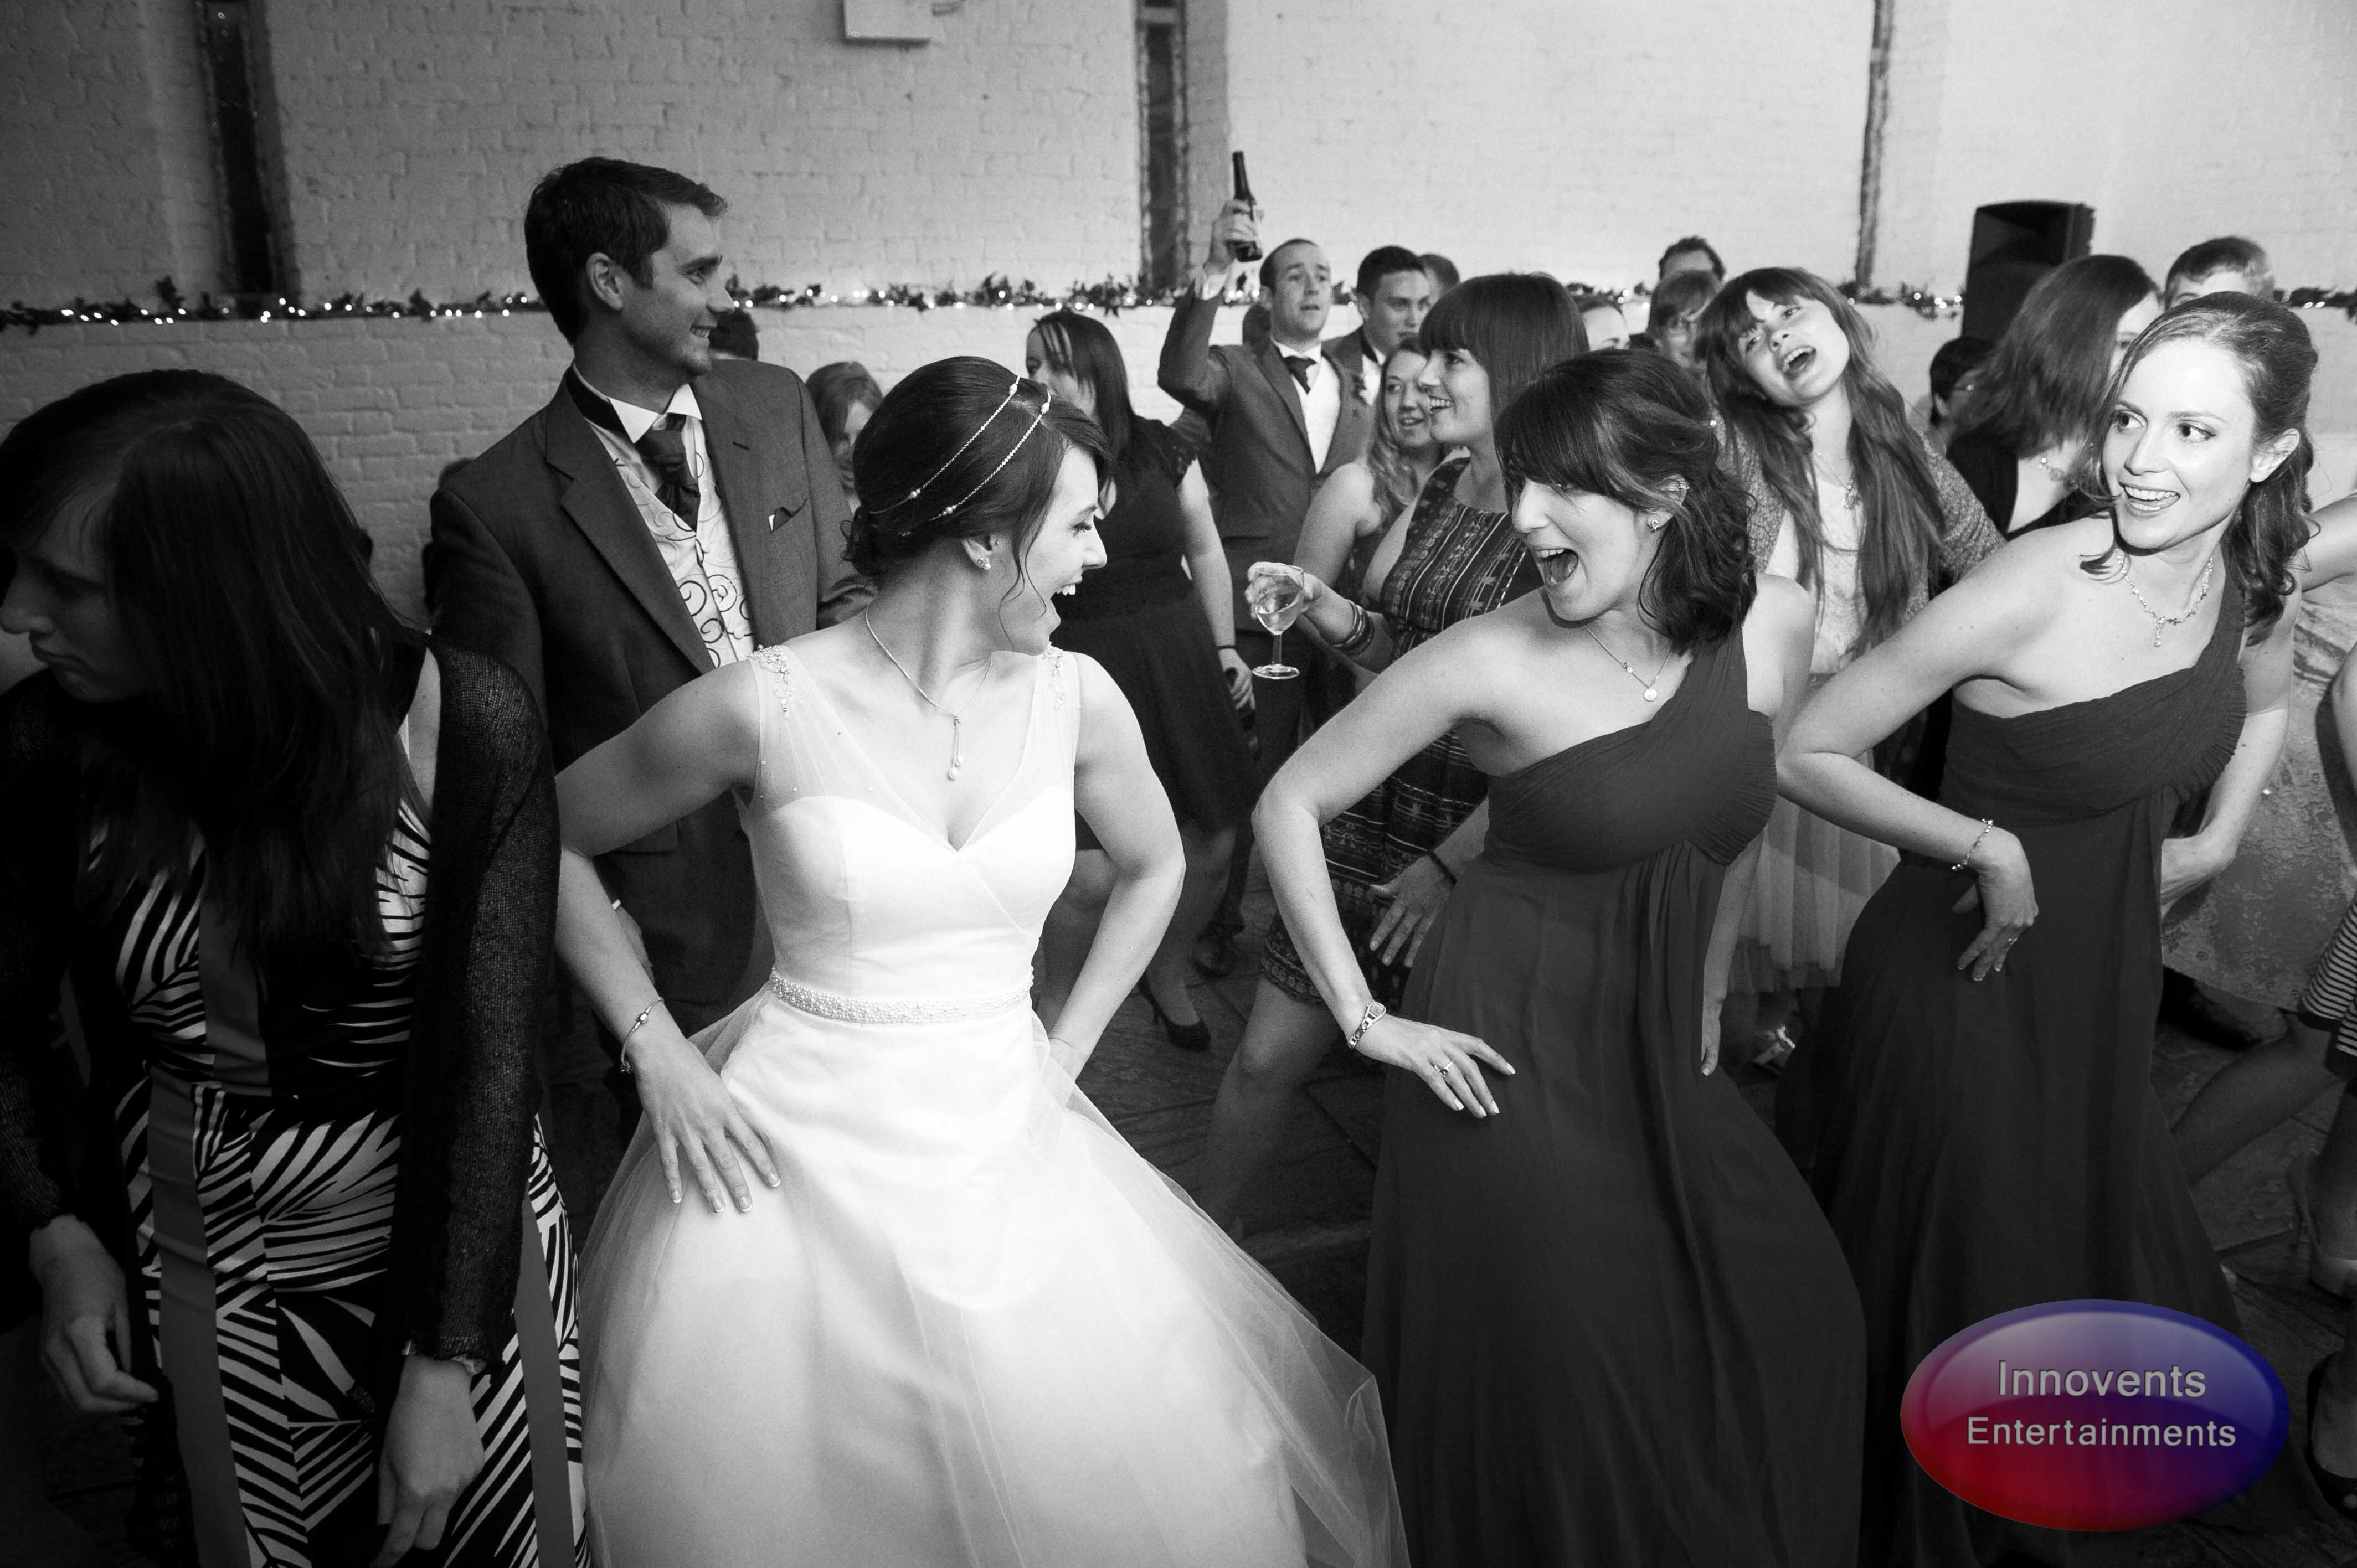 Dancing at Ufton Court